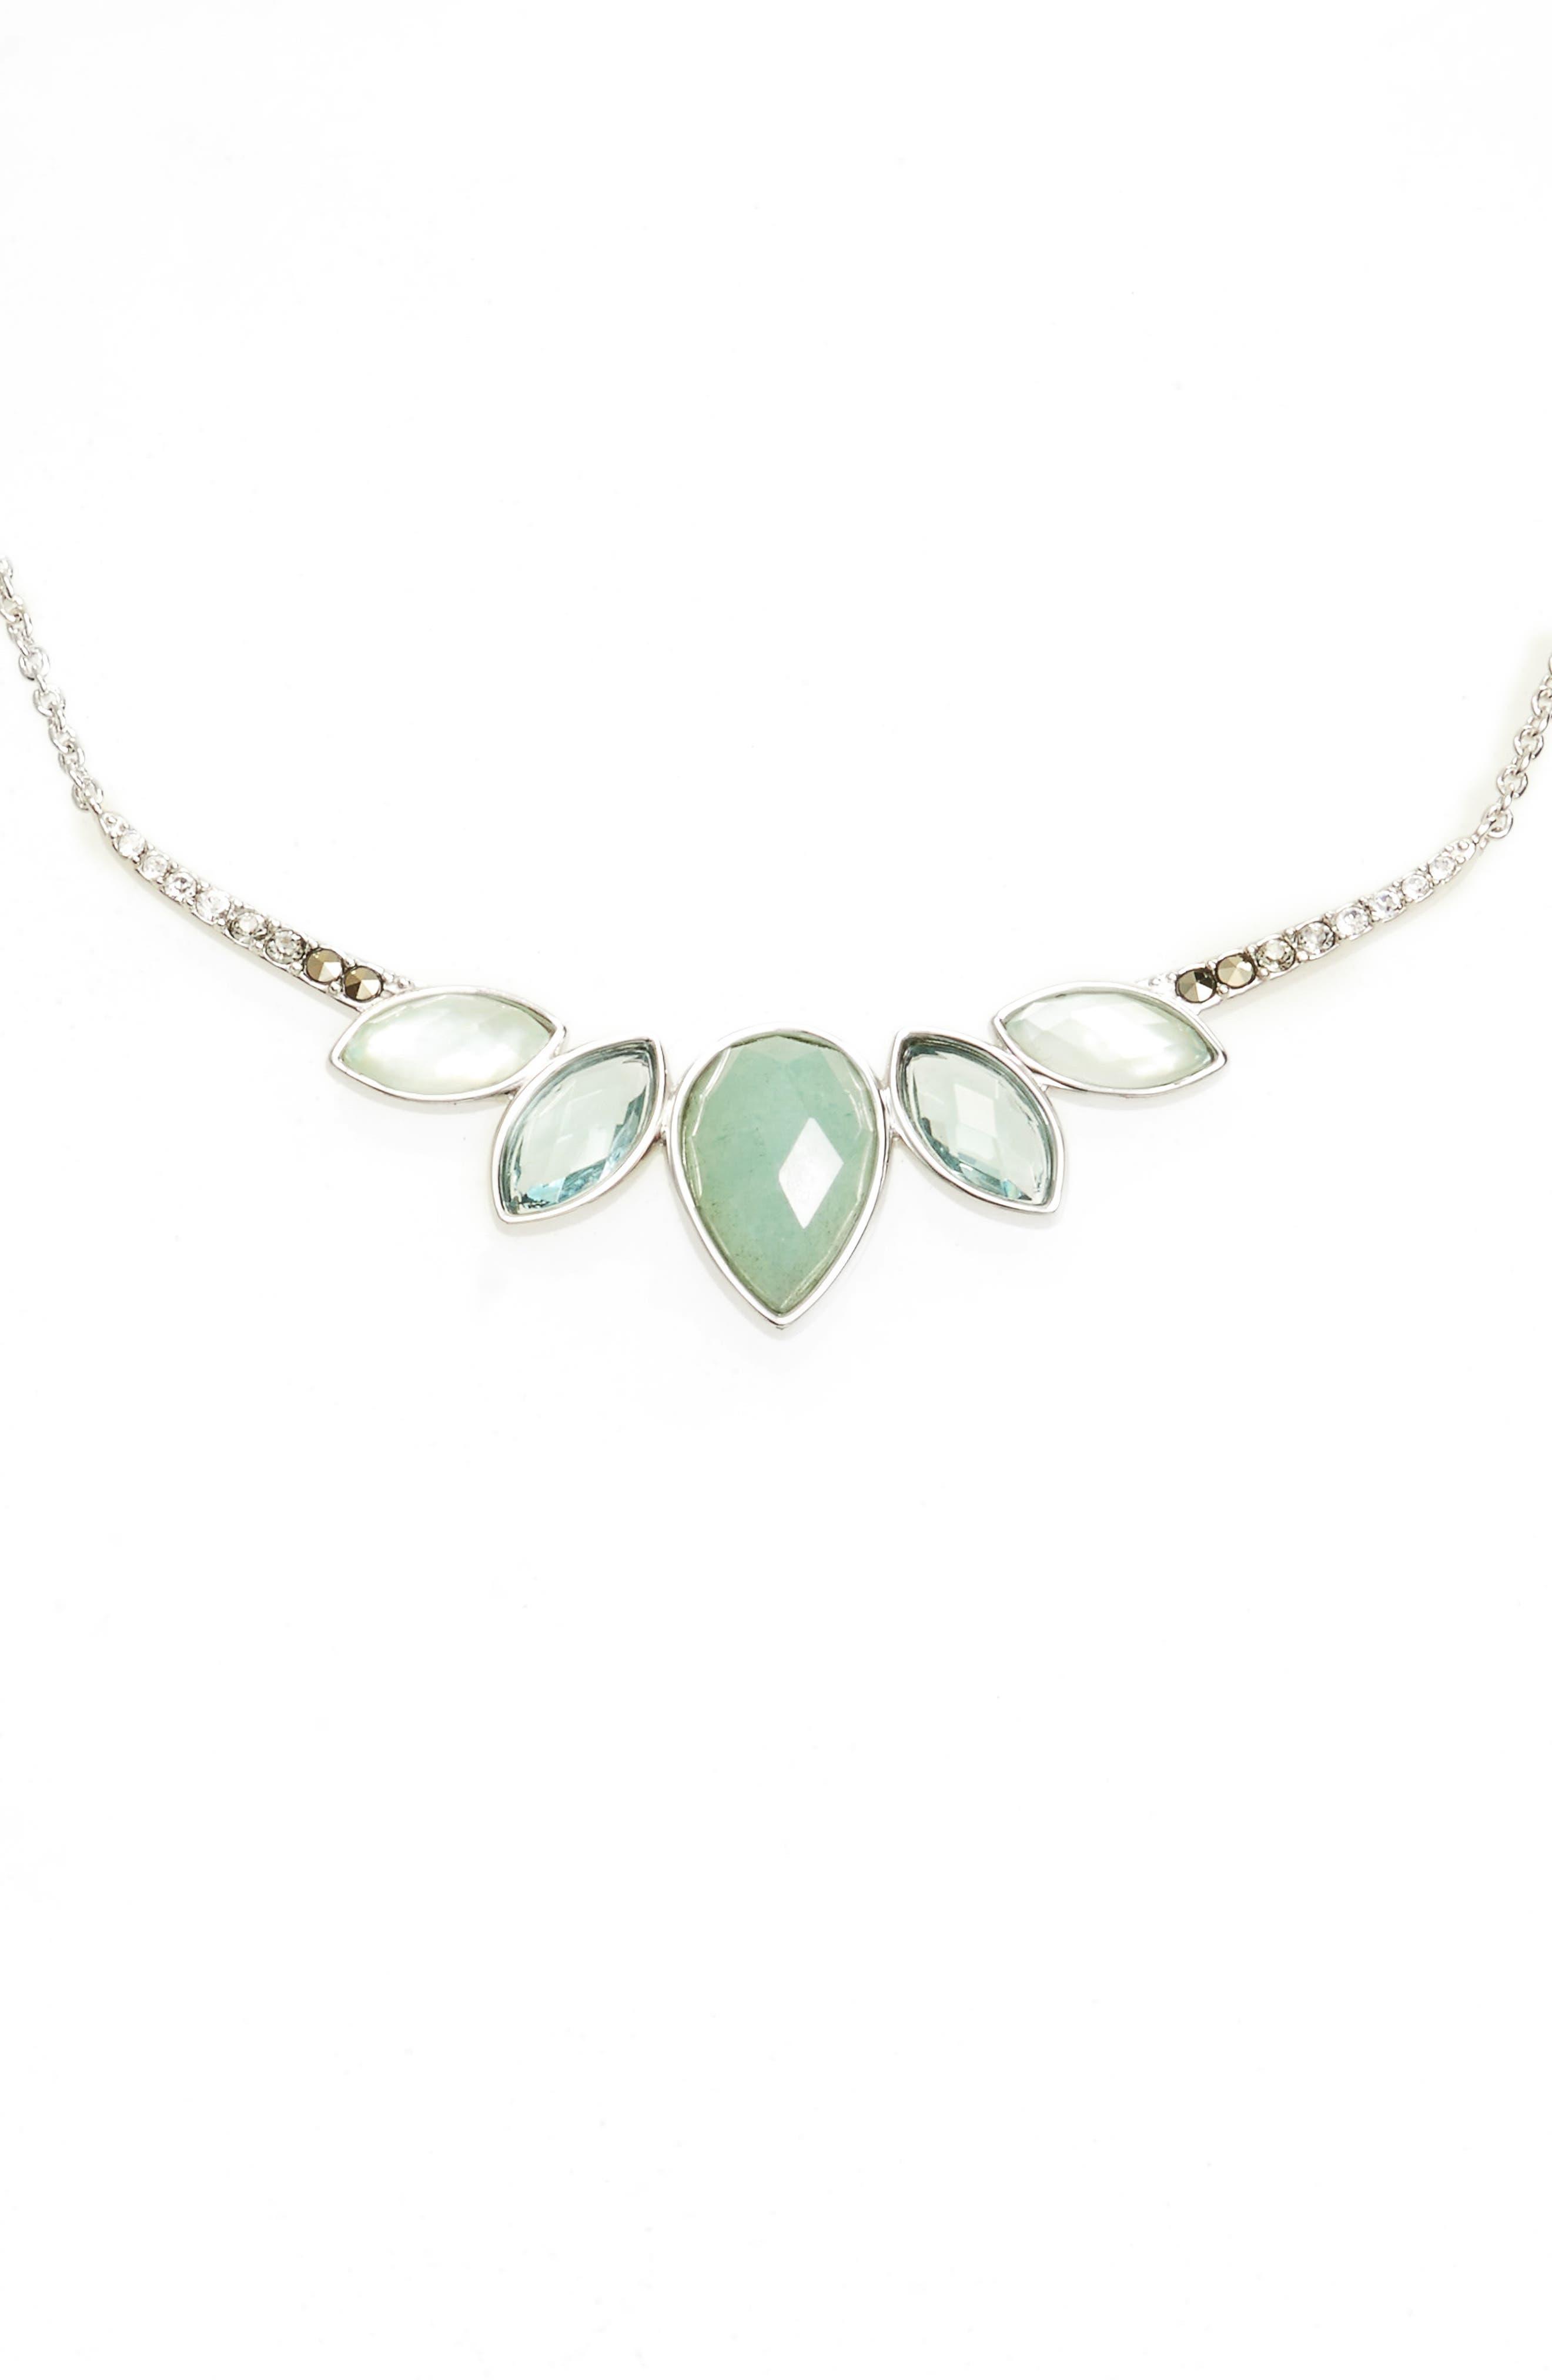 Main Image - Judith Jack Lakeside Crystal Frontal Necklace